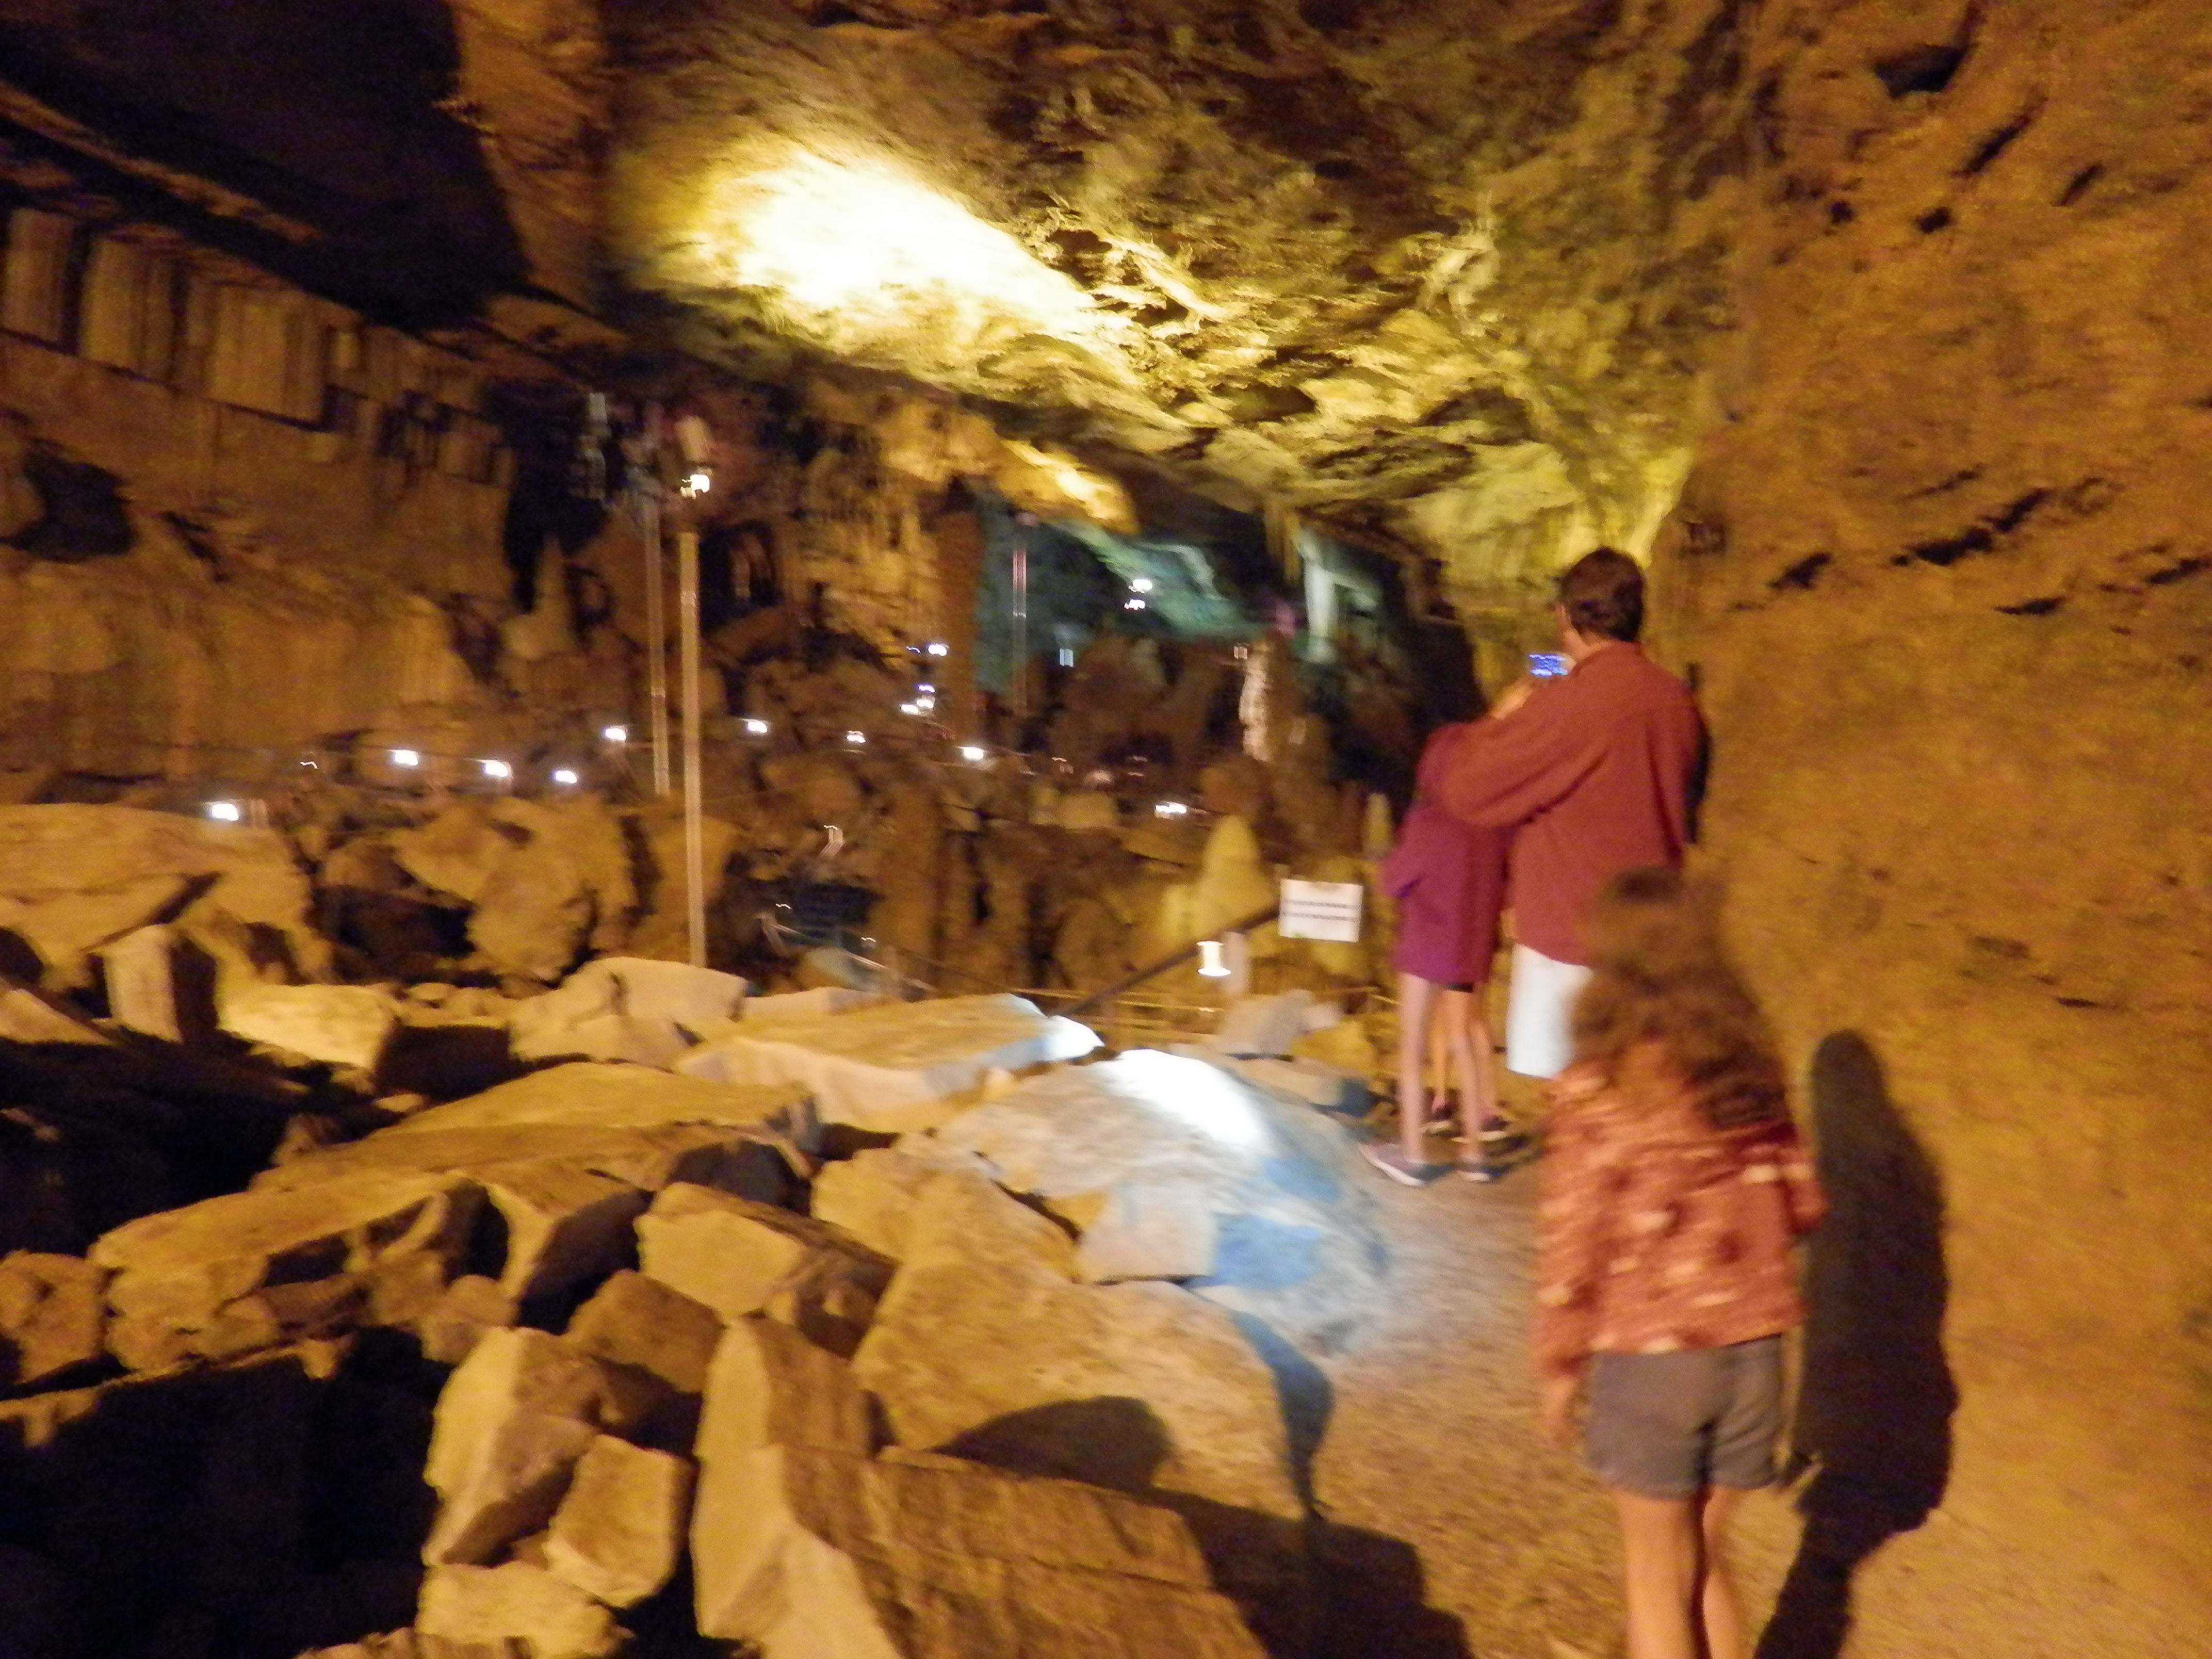 Lost World Caverns 171 3jamblog